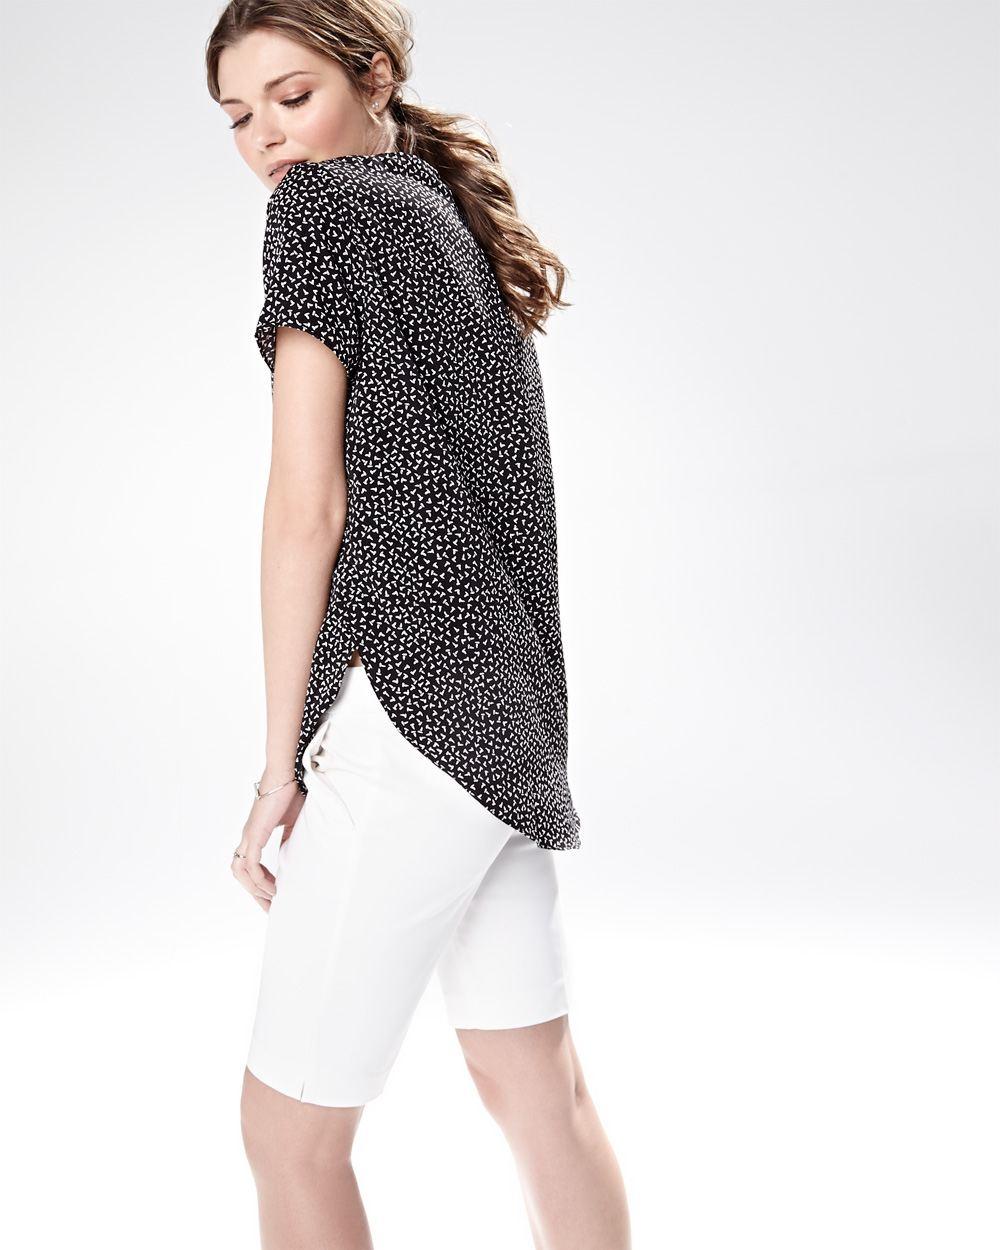 Zenobia Short Sleeve Printed Blouse 35